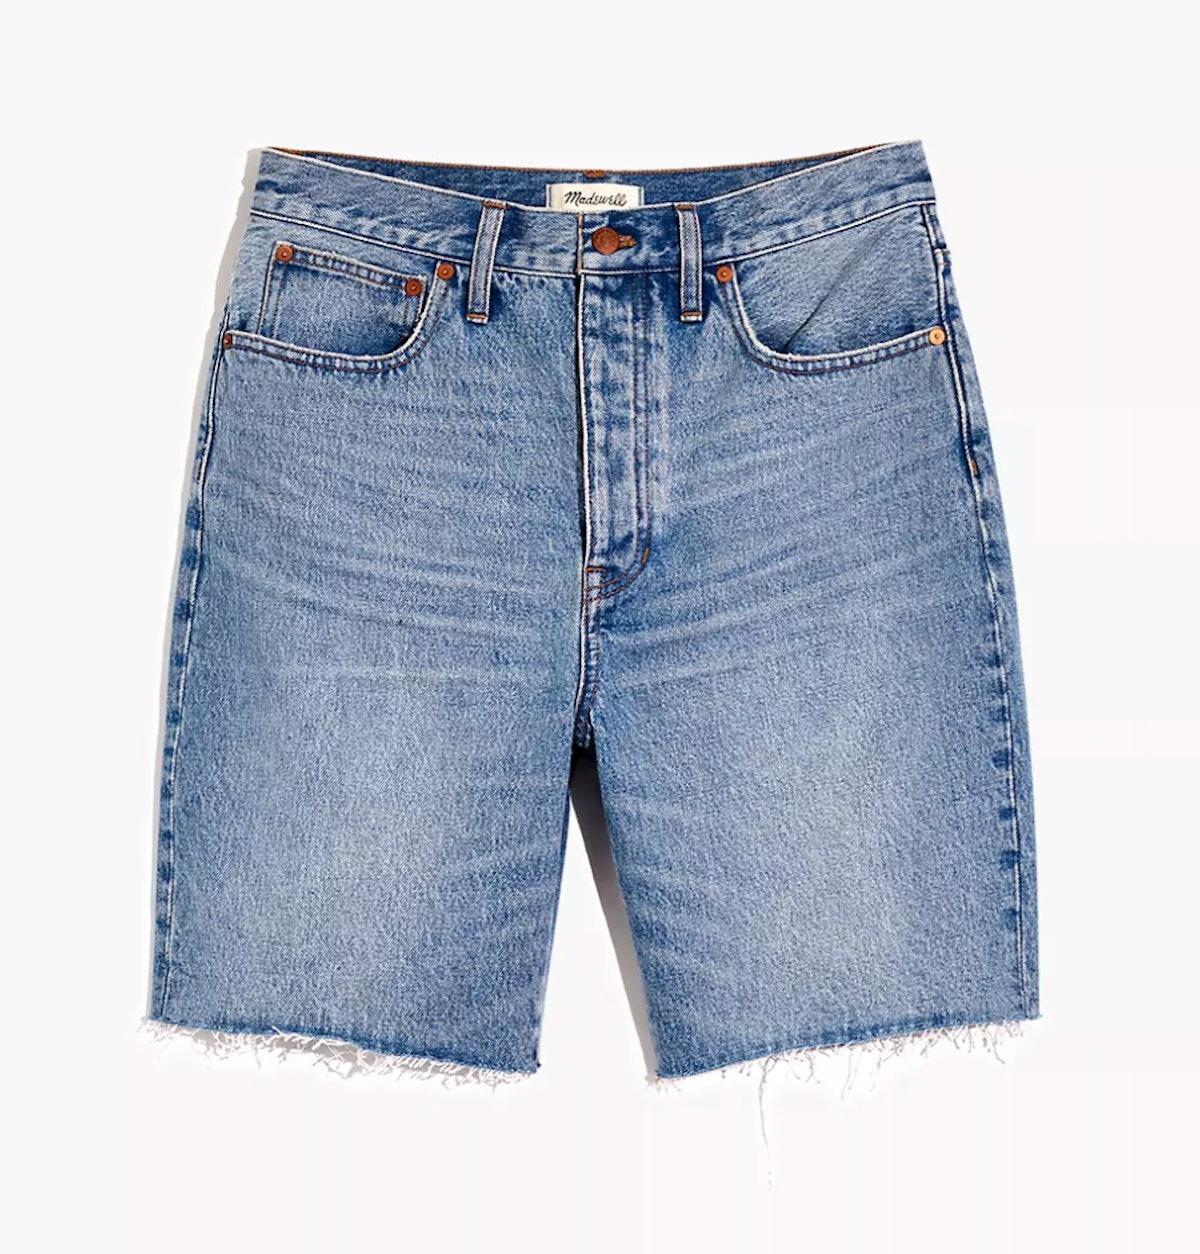 Madewell's baggy denim bermuda shorts.